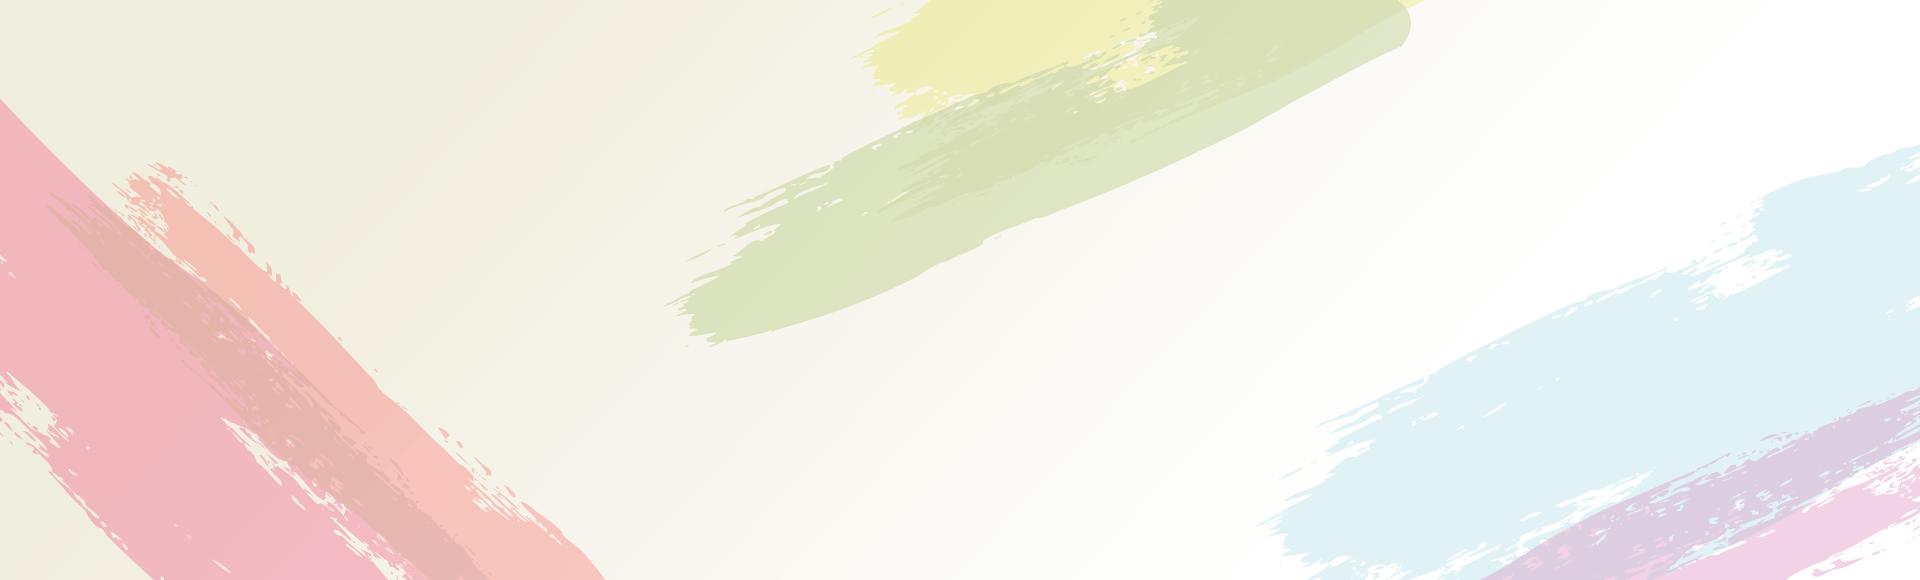 fondo8_1920X580